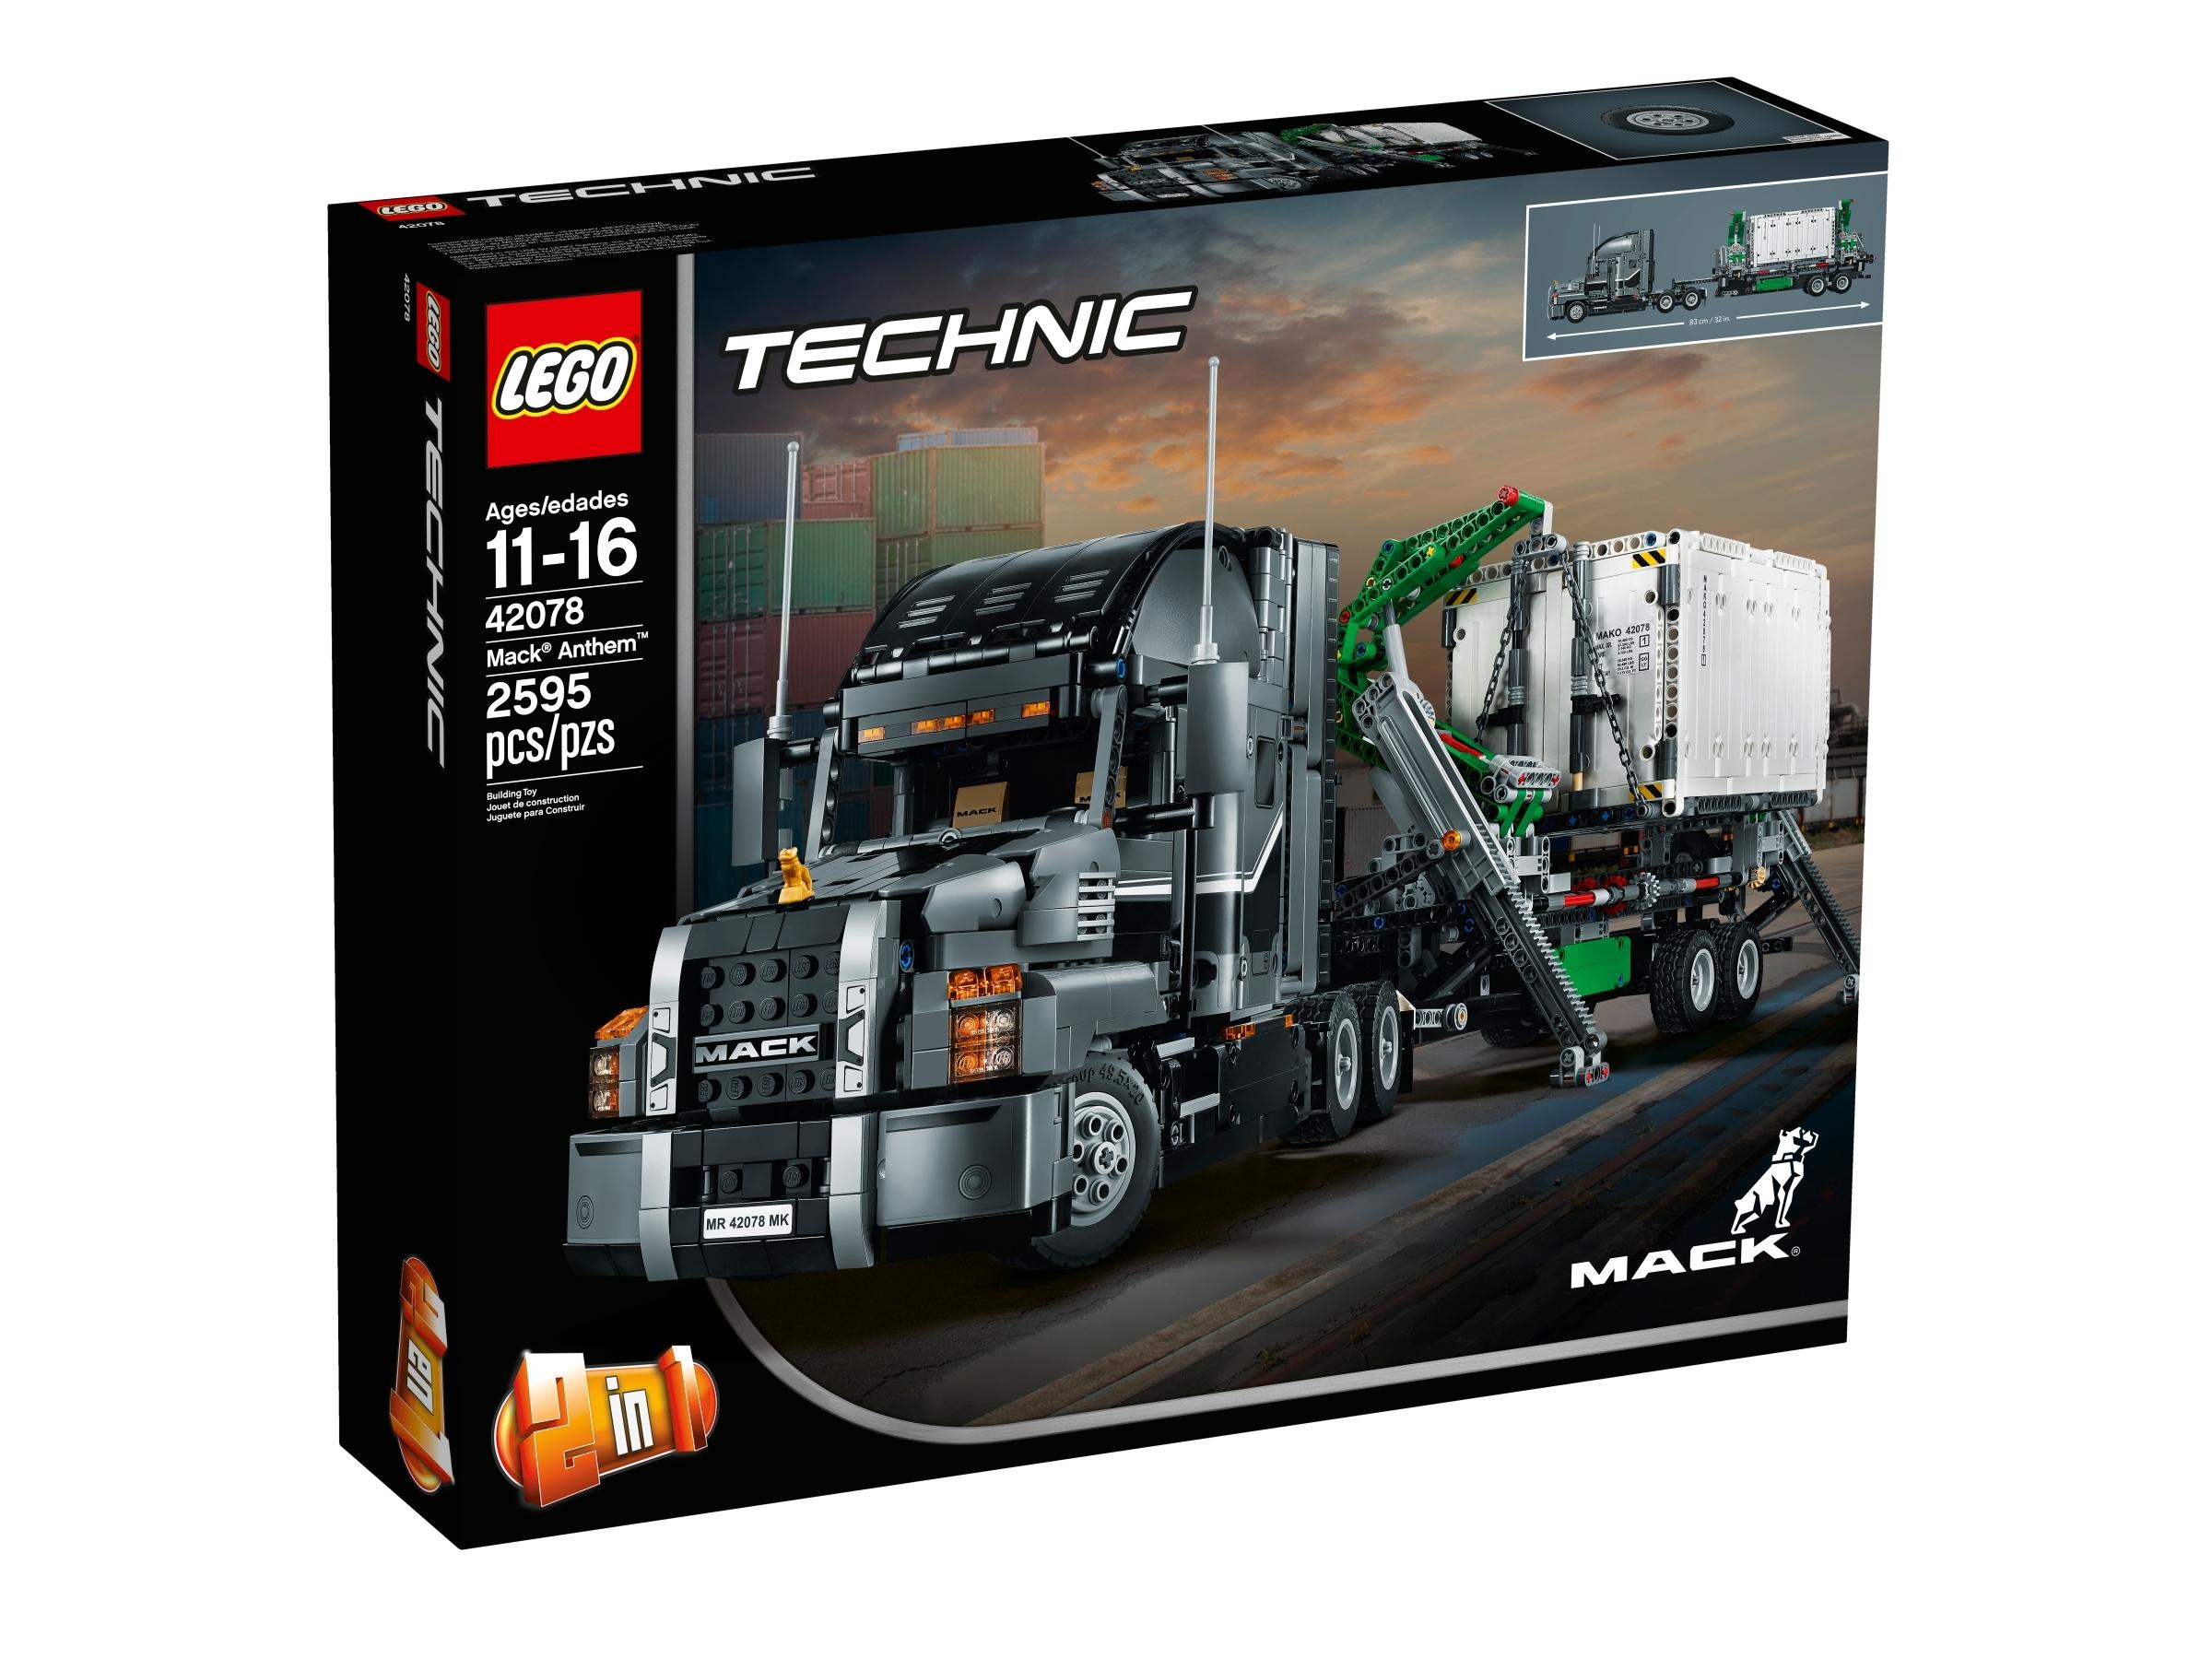 Mack Anthem 42078 Technic Buy Online At The Official Lego Shop Au